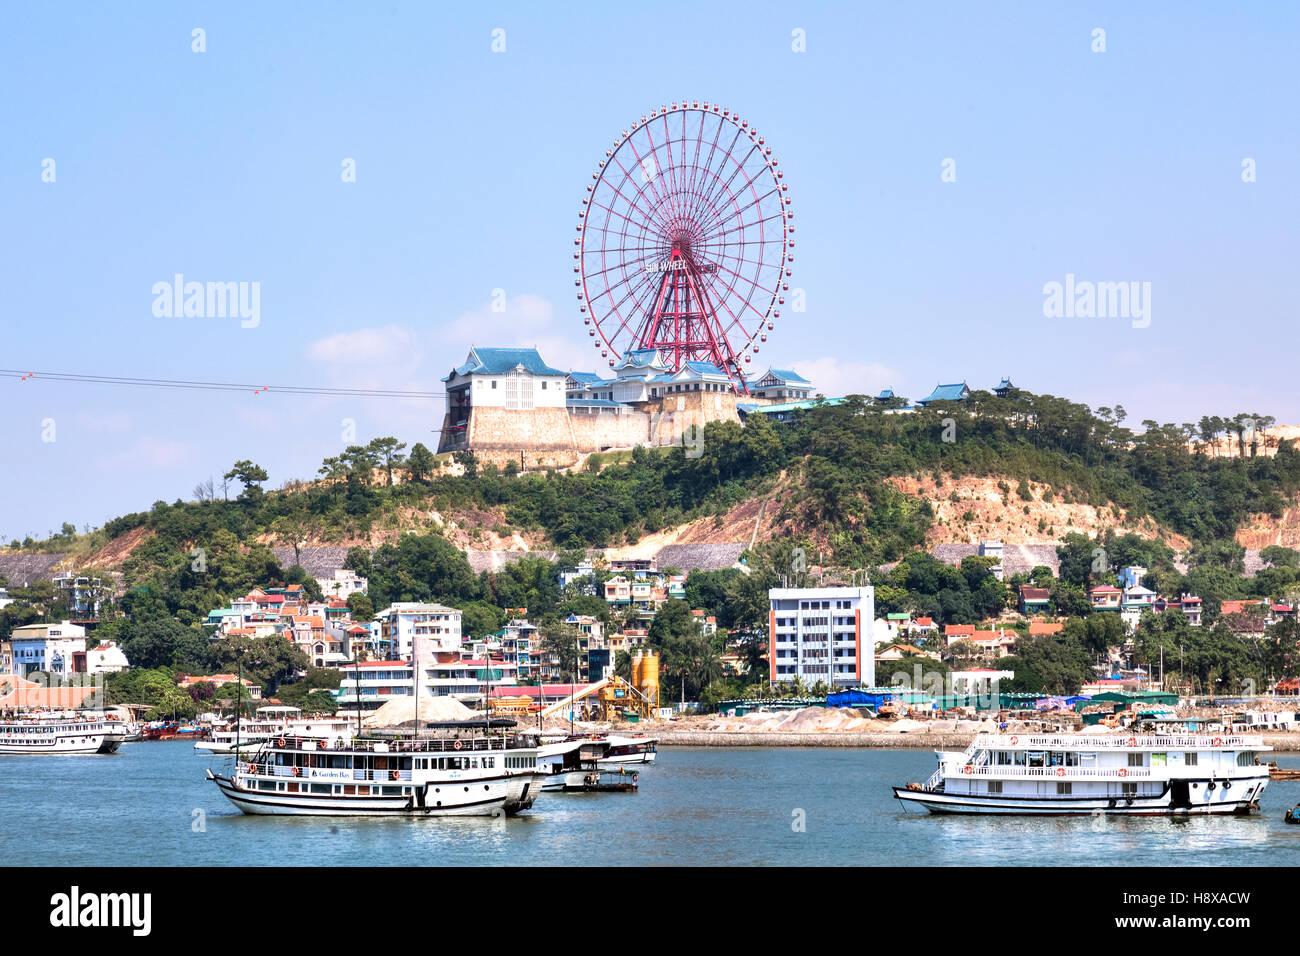 Ha Long Roue Sun, Halong Bay, Vietnam, l'Indochine, l'Asie Photo Stock